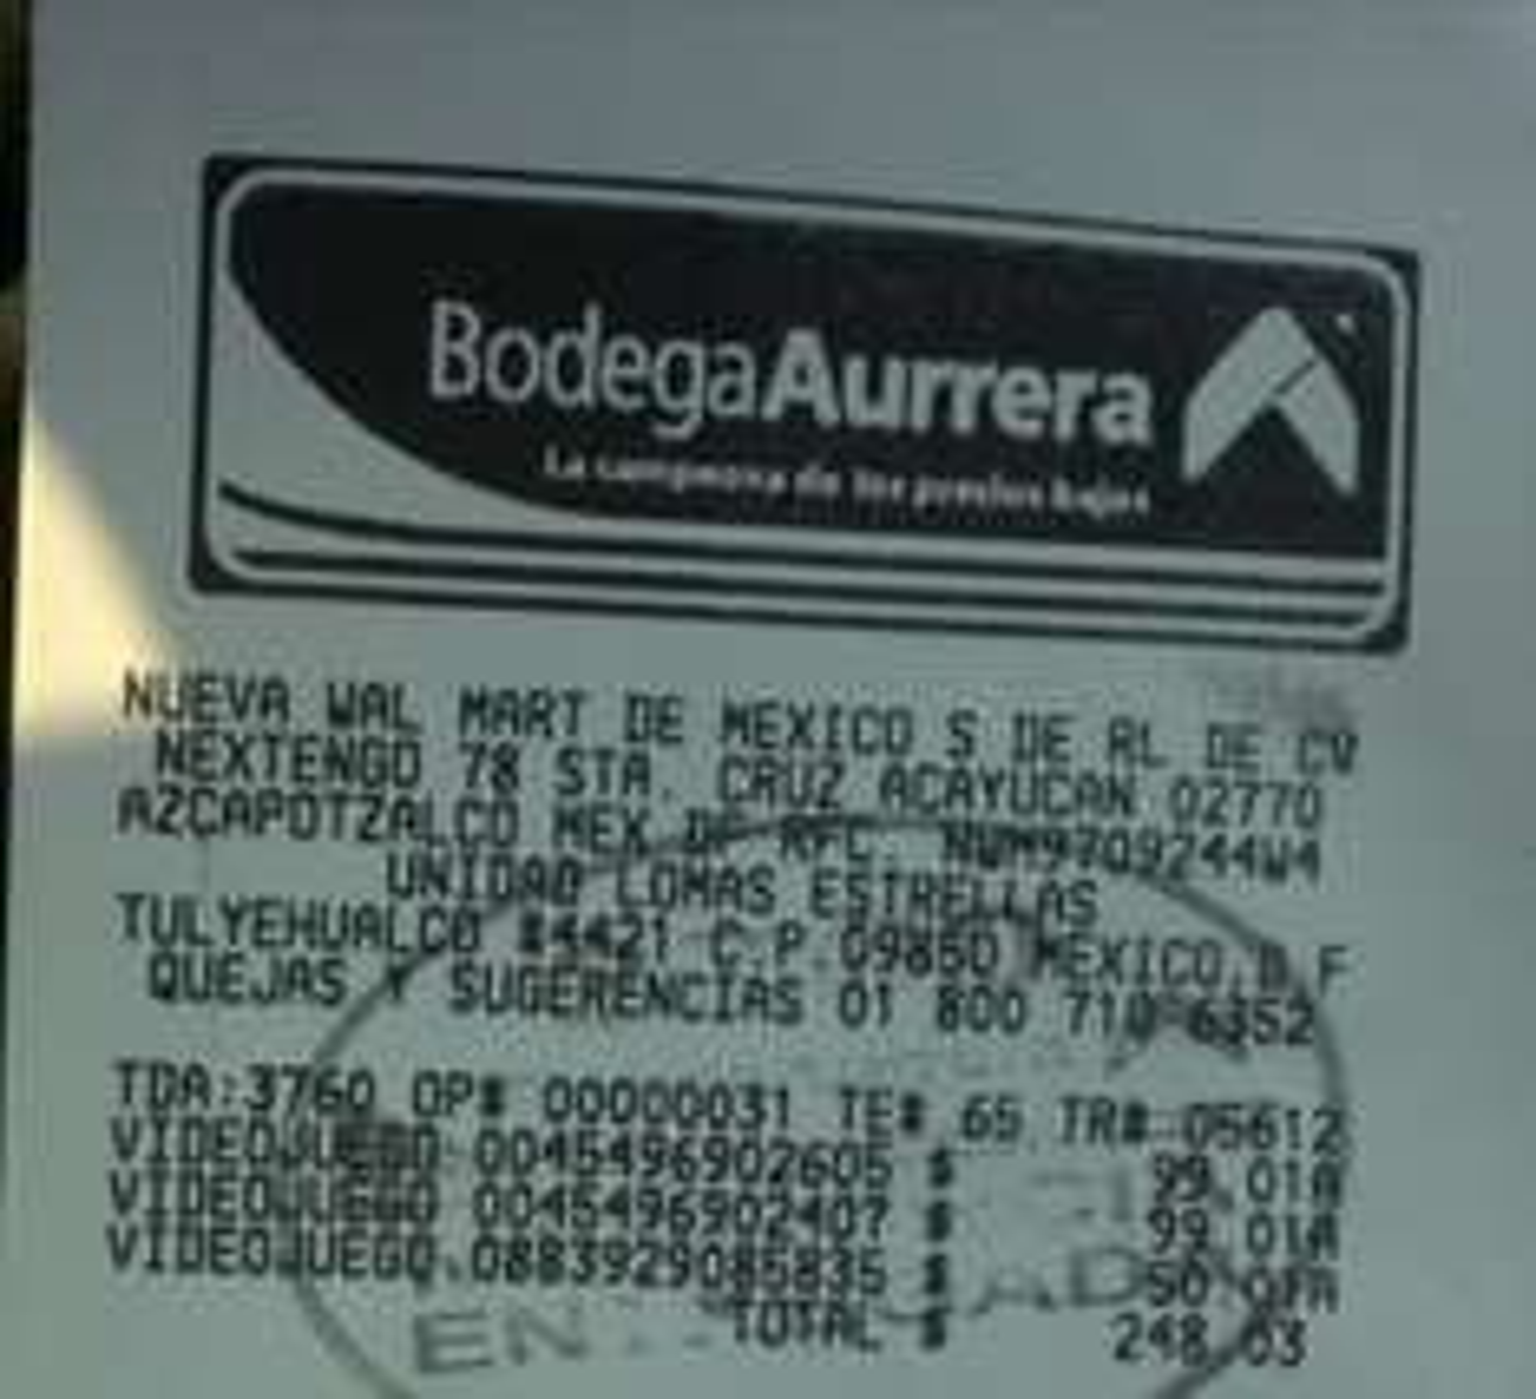 Juegos de Wii en oferta Bodega Aurrera